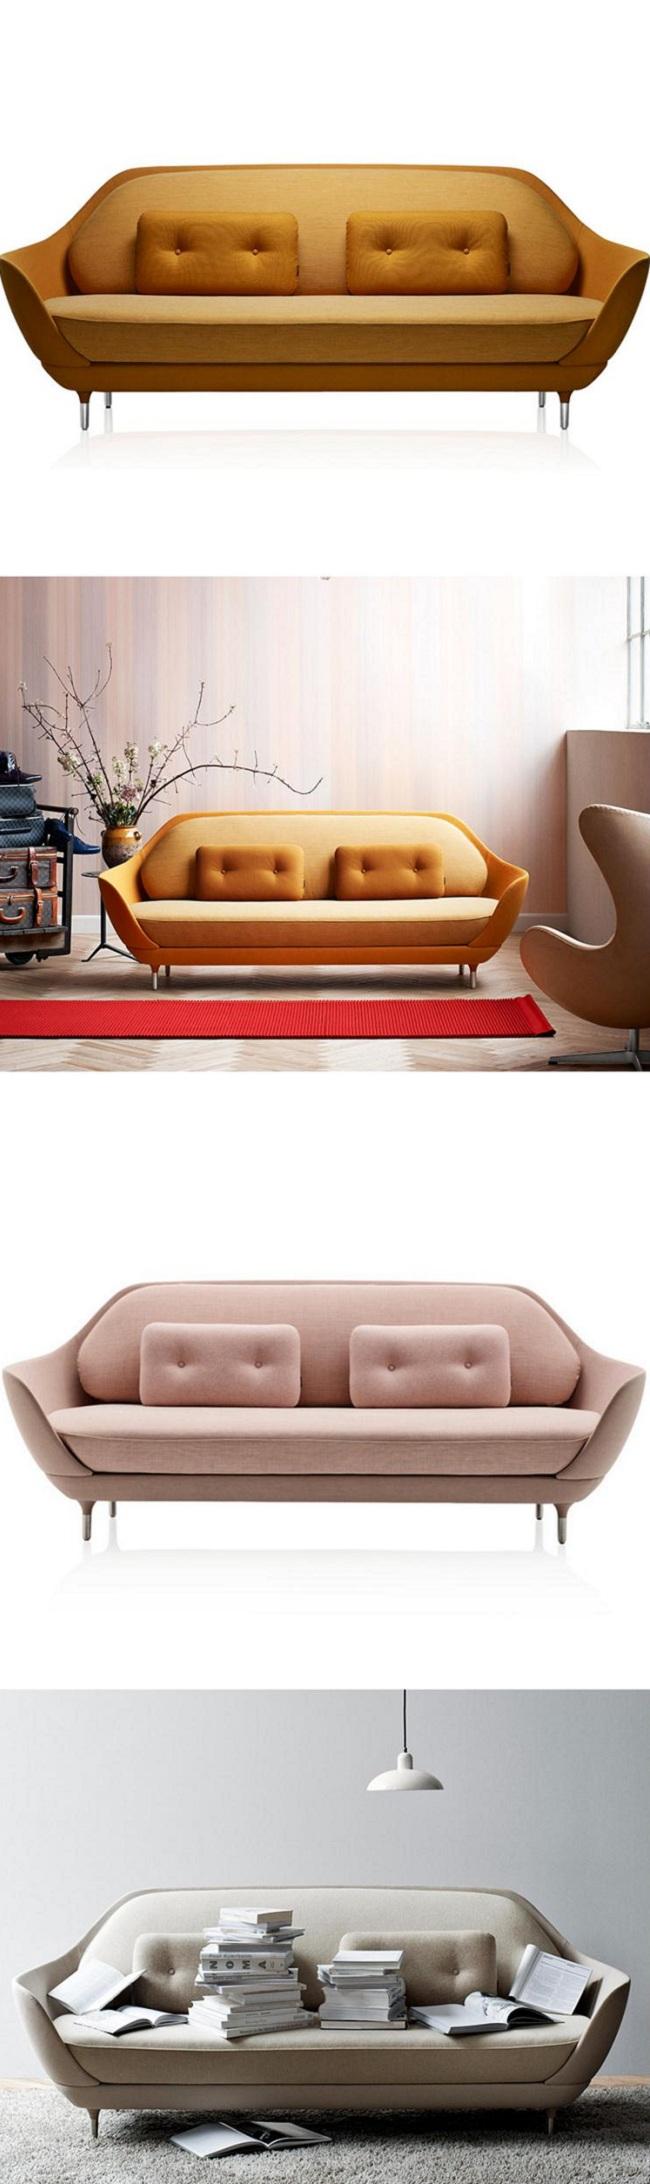 Nordic Simple Favn Sofa Coquille Sofa Multi Person Sofa Fabric Sofa